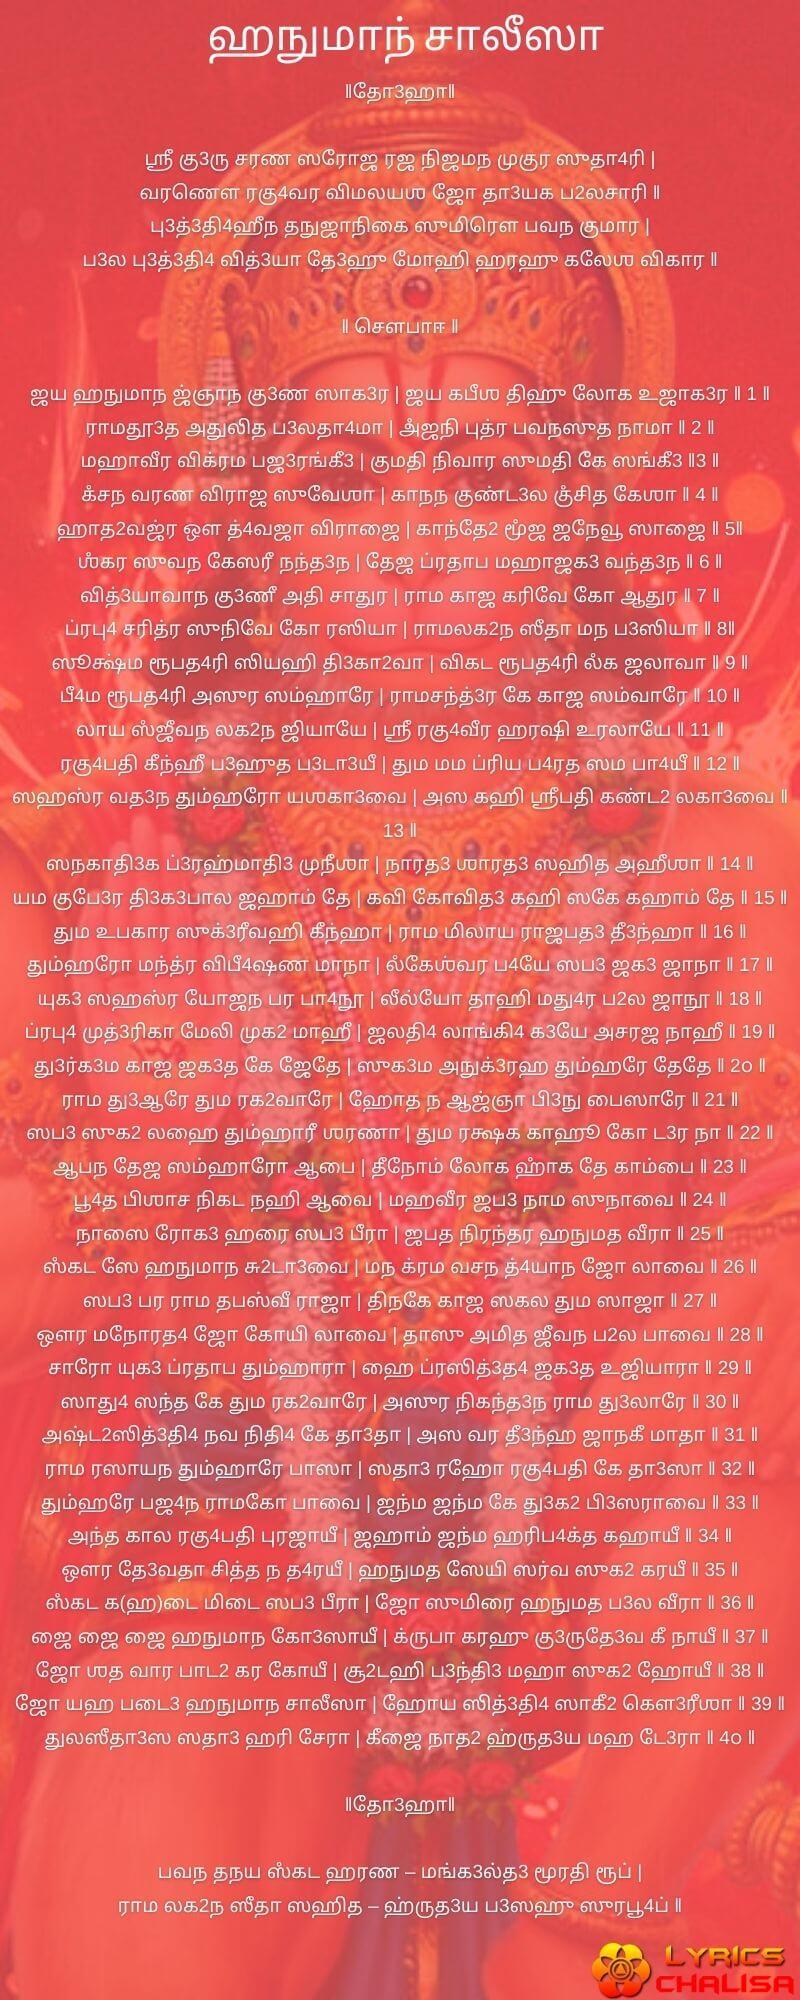 Shree Hanuman Chalisa Lyrics In Tamil